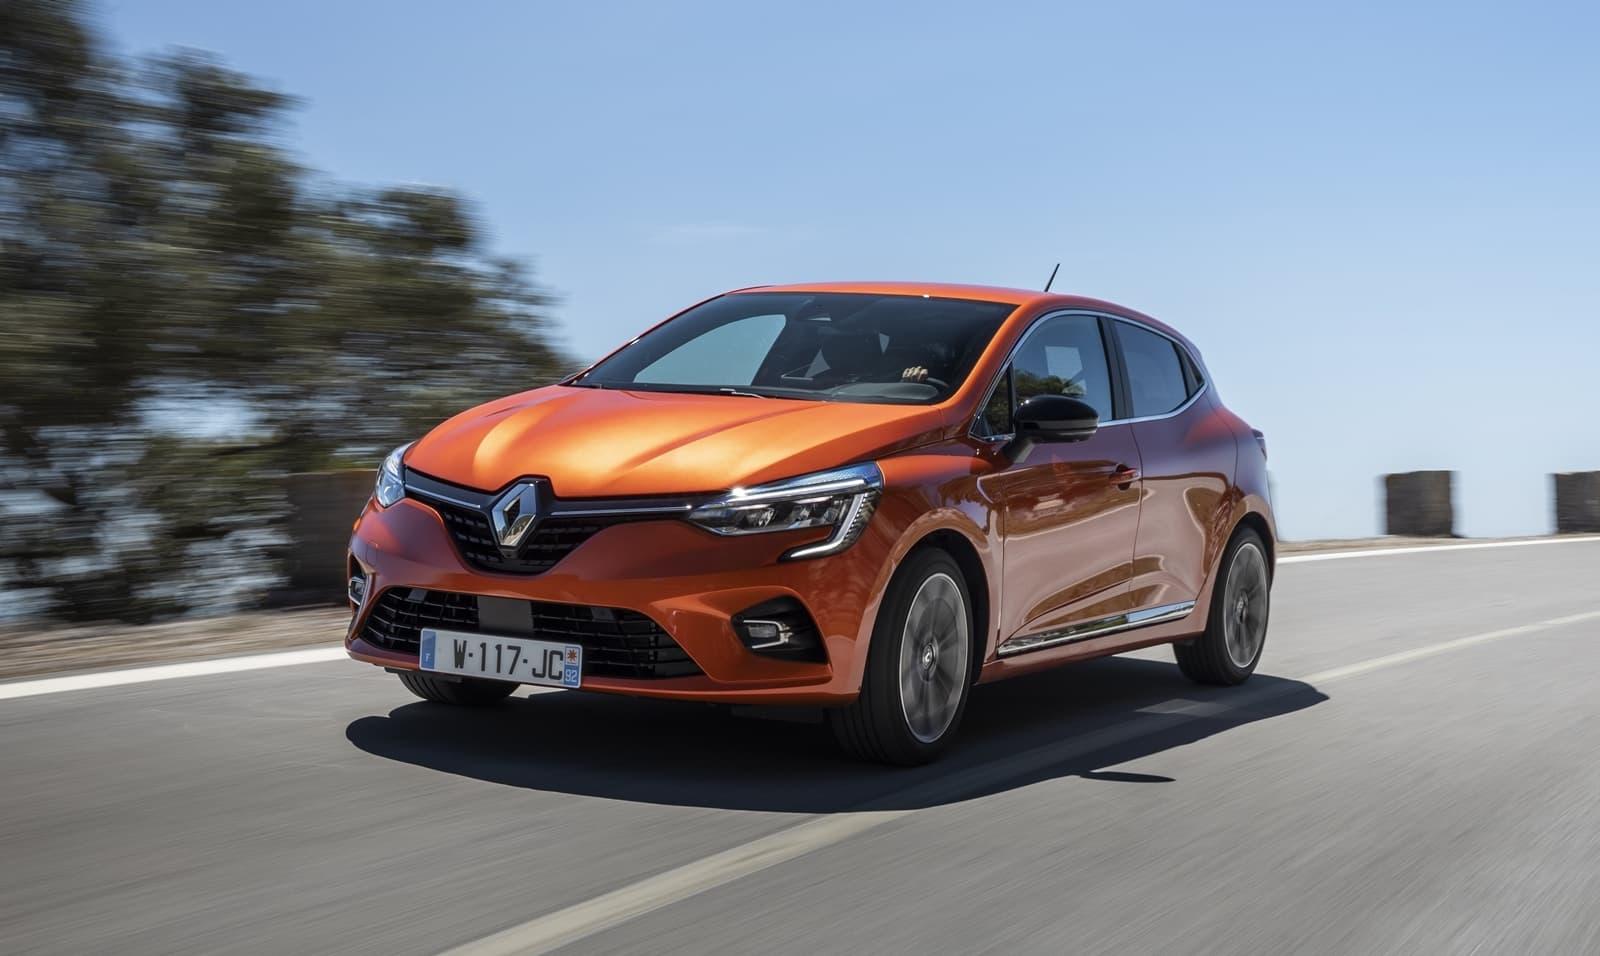 Renault Clio 2020 Prueba 0619 004